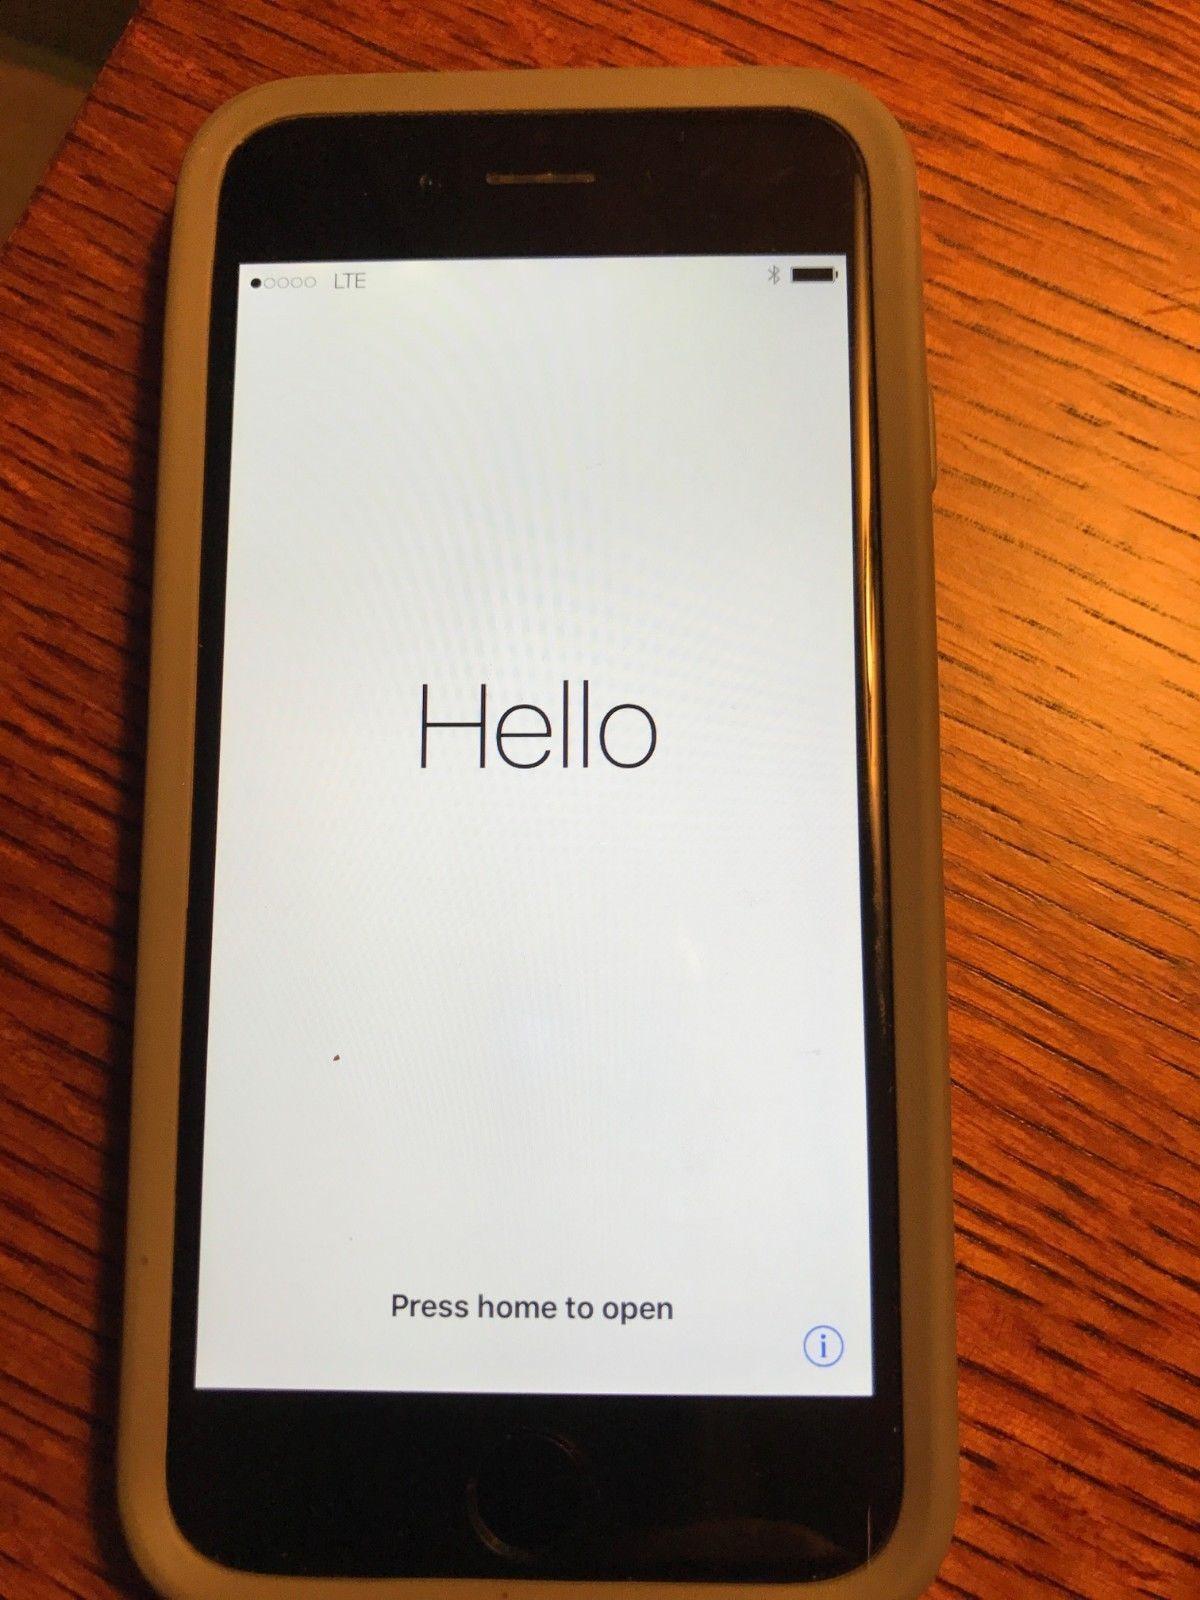 Apple iPhone 6 - 64GB - Space Gray (Verizon) Smartphone  https://t.co/EqpUFBt7J1 https://t.co/kAKwiw8E40